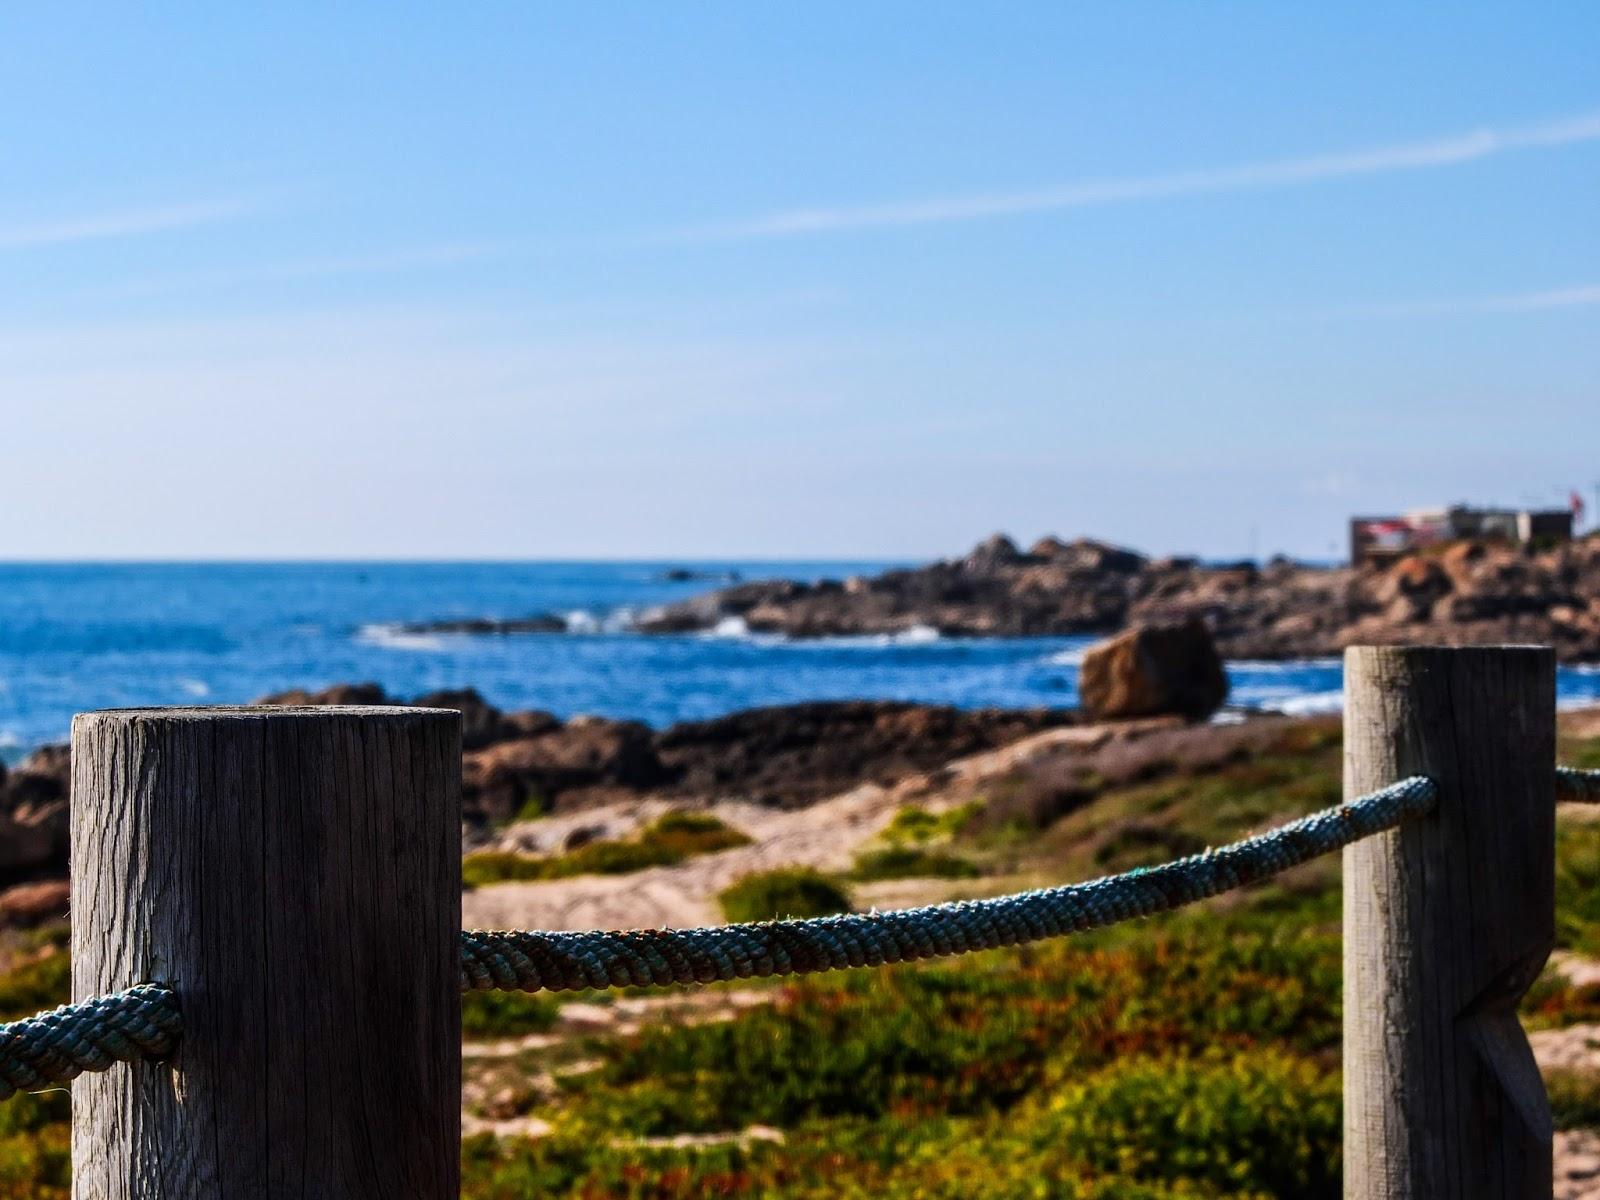 Beach Boardwalk up close in Porto, Portugal.